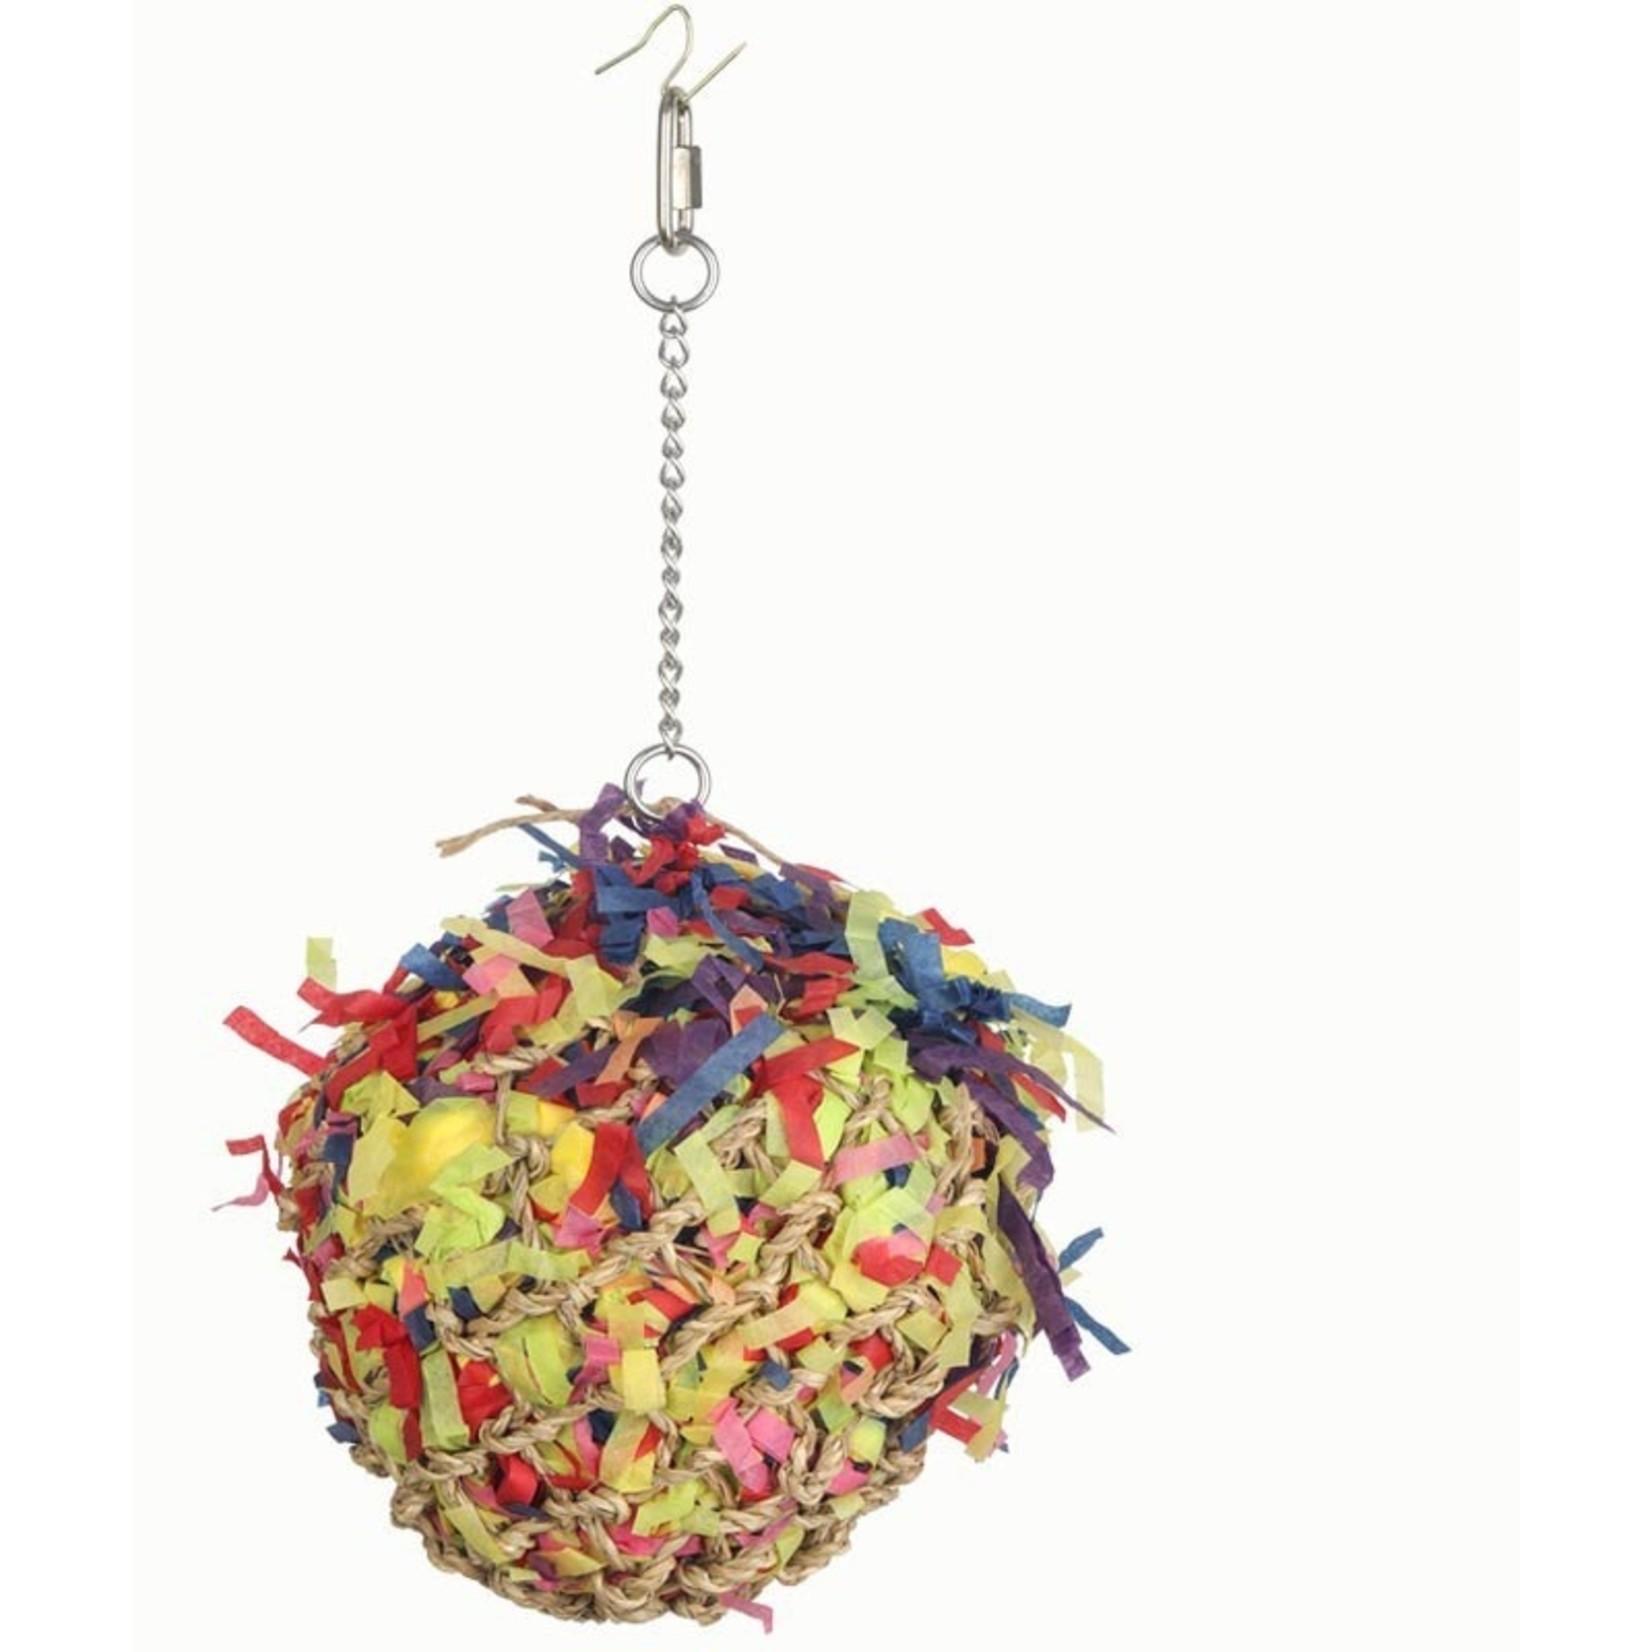 Vogelspeelgoed Confetti Ball